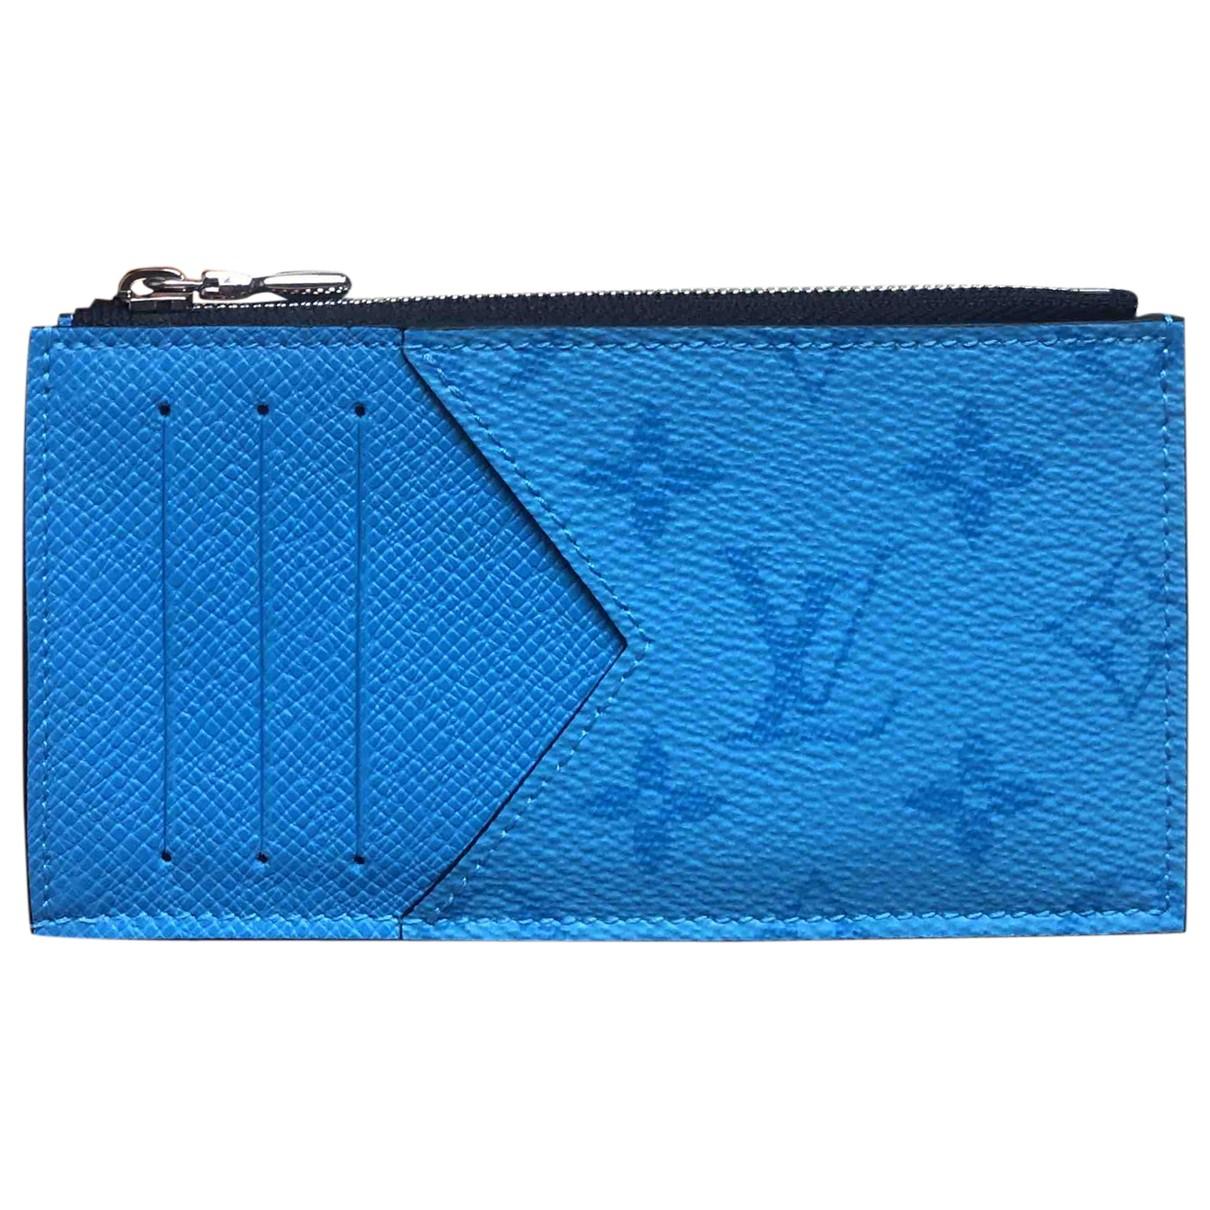 Louis Vuitton \N Blue Cloth Purses, wallet & cases for Women \N